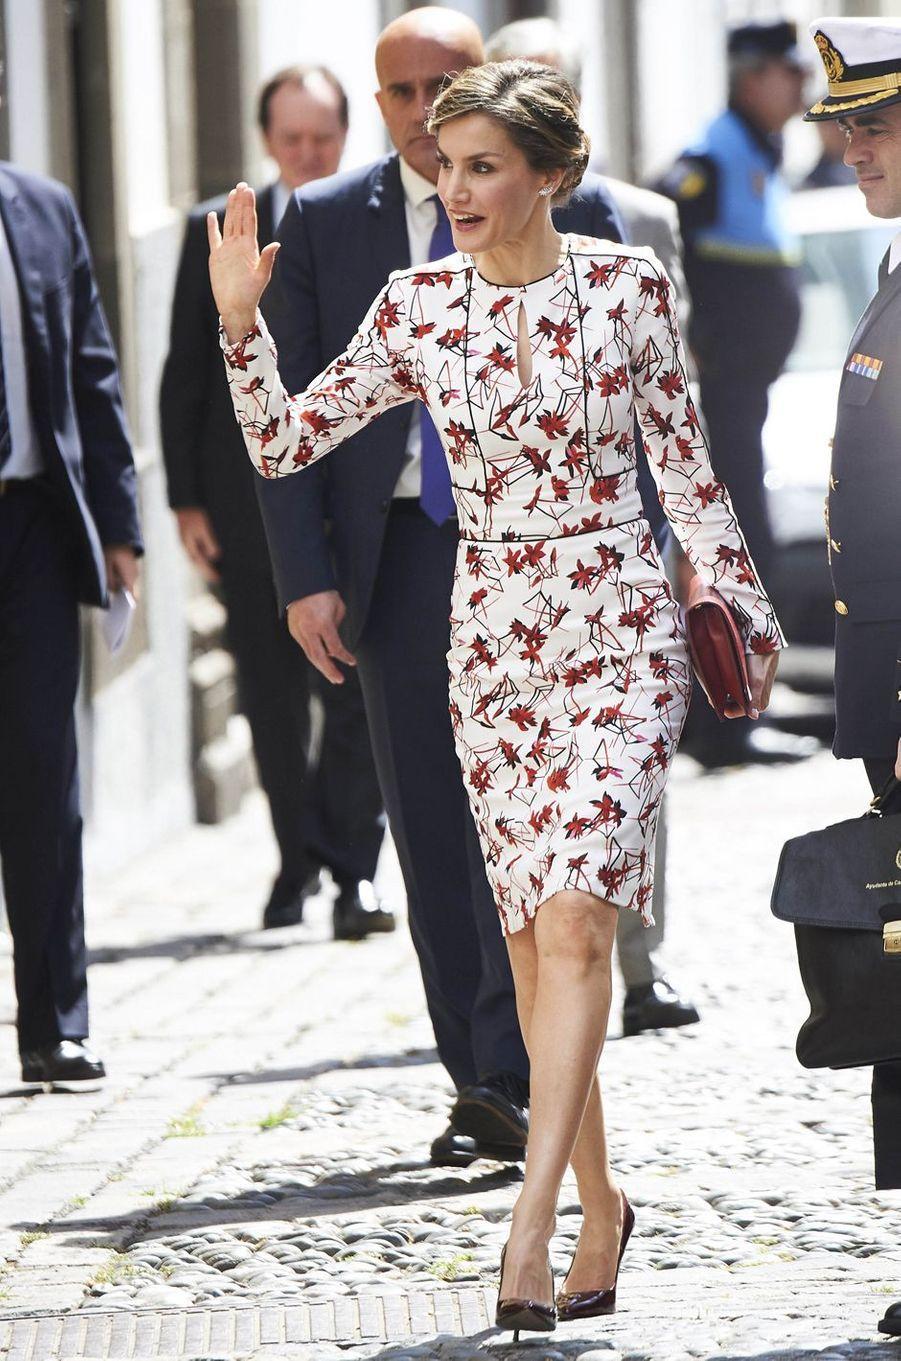 La reine Letizia d'Espagne dans sa robe Carolina Herrera sur l'île de Grande Canarie, le 24 avril 2017